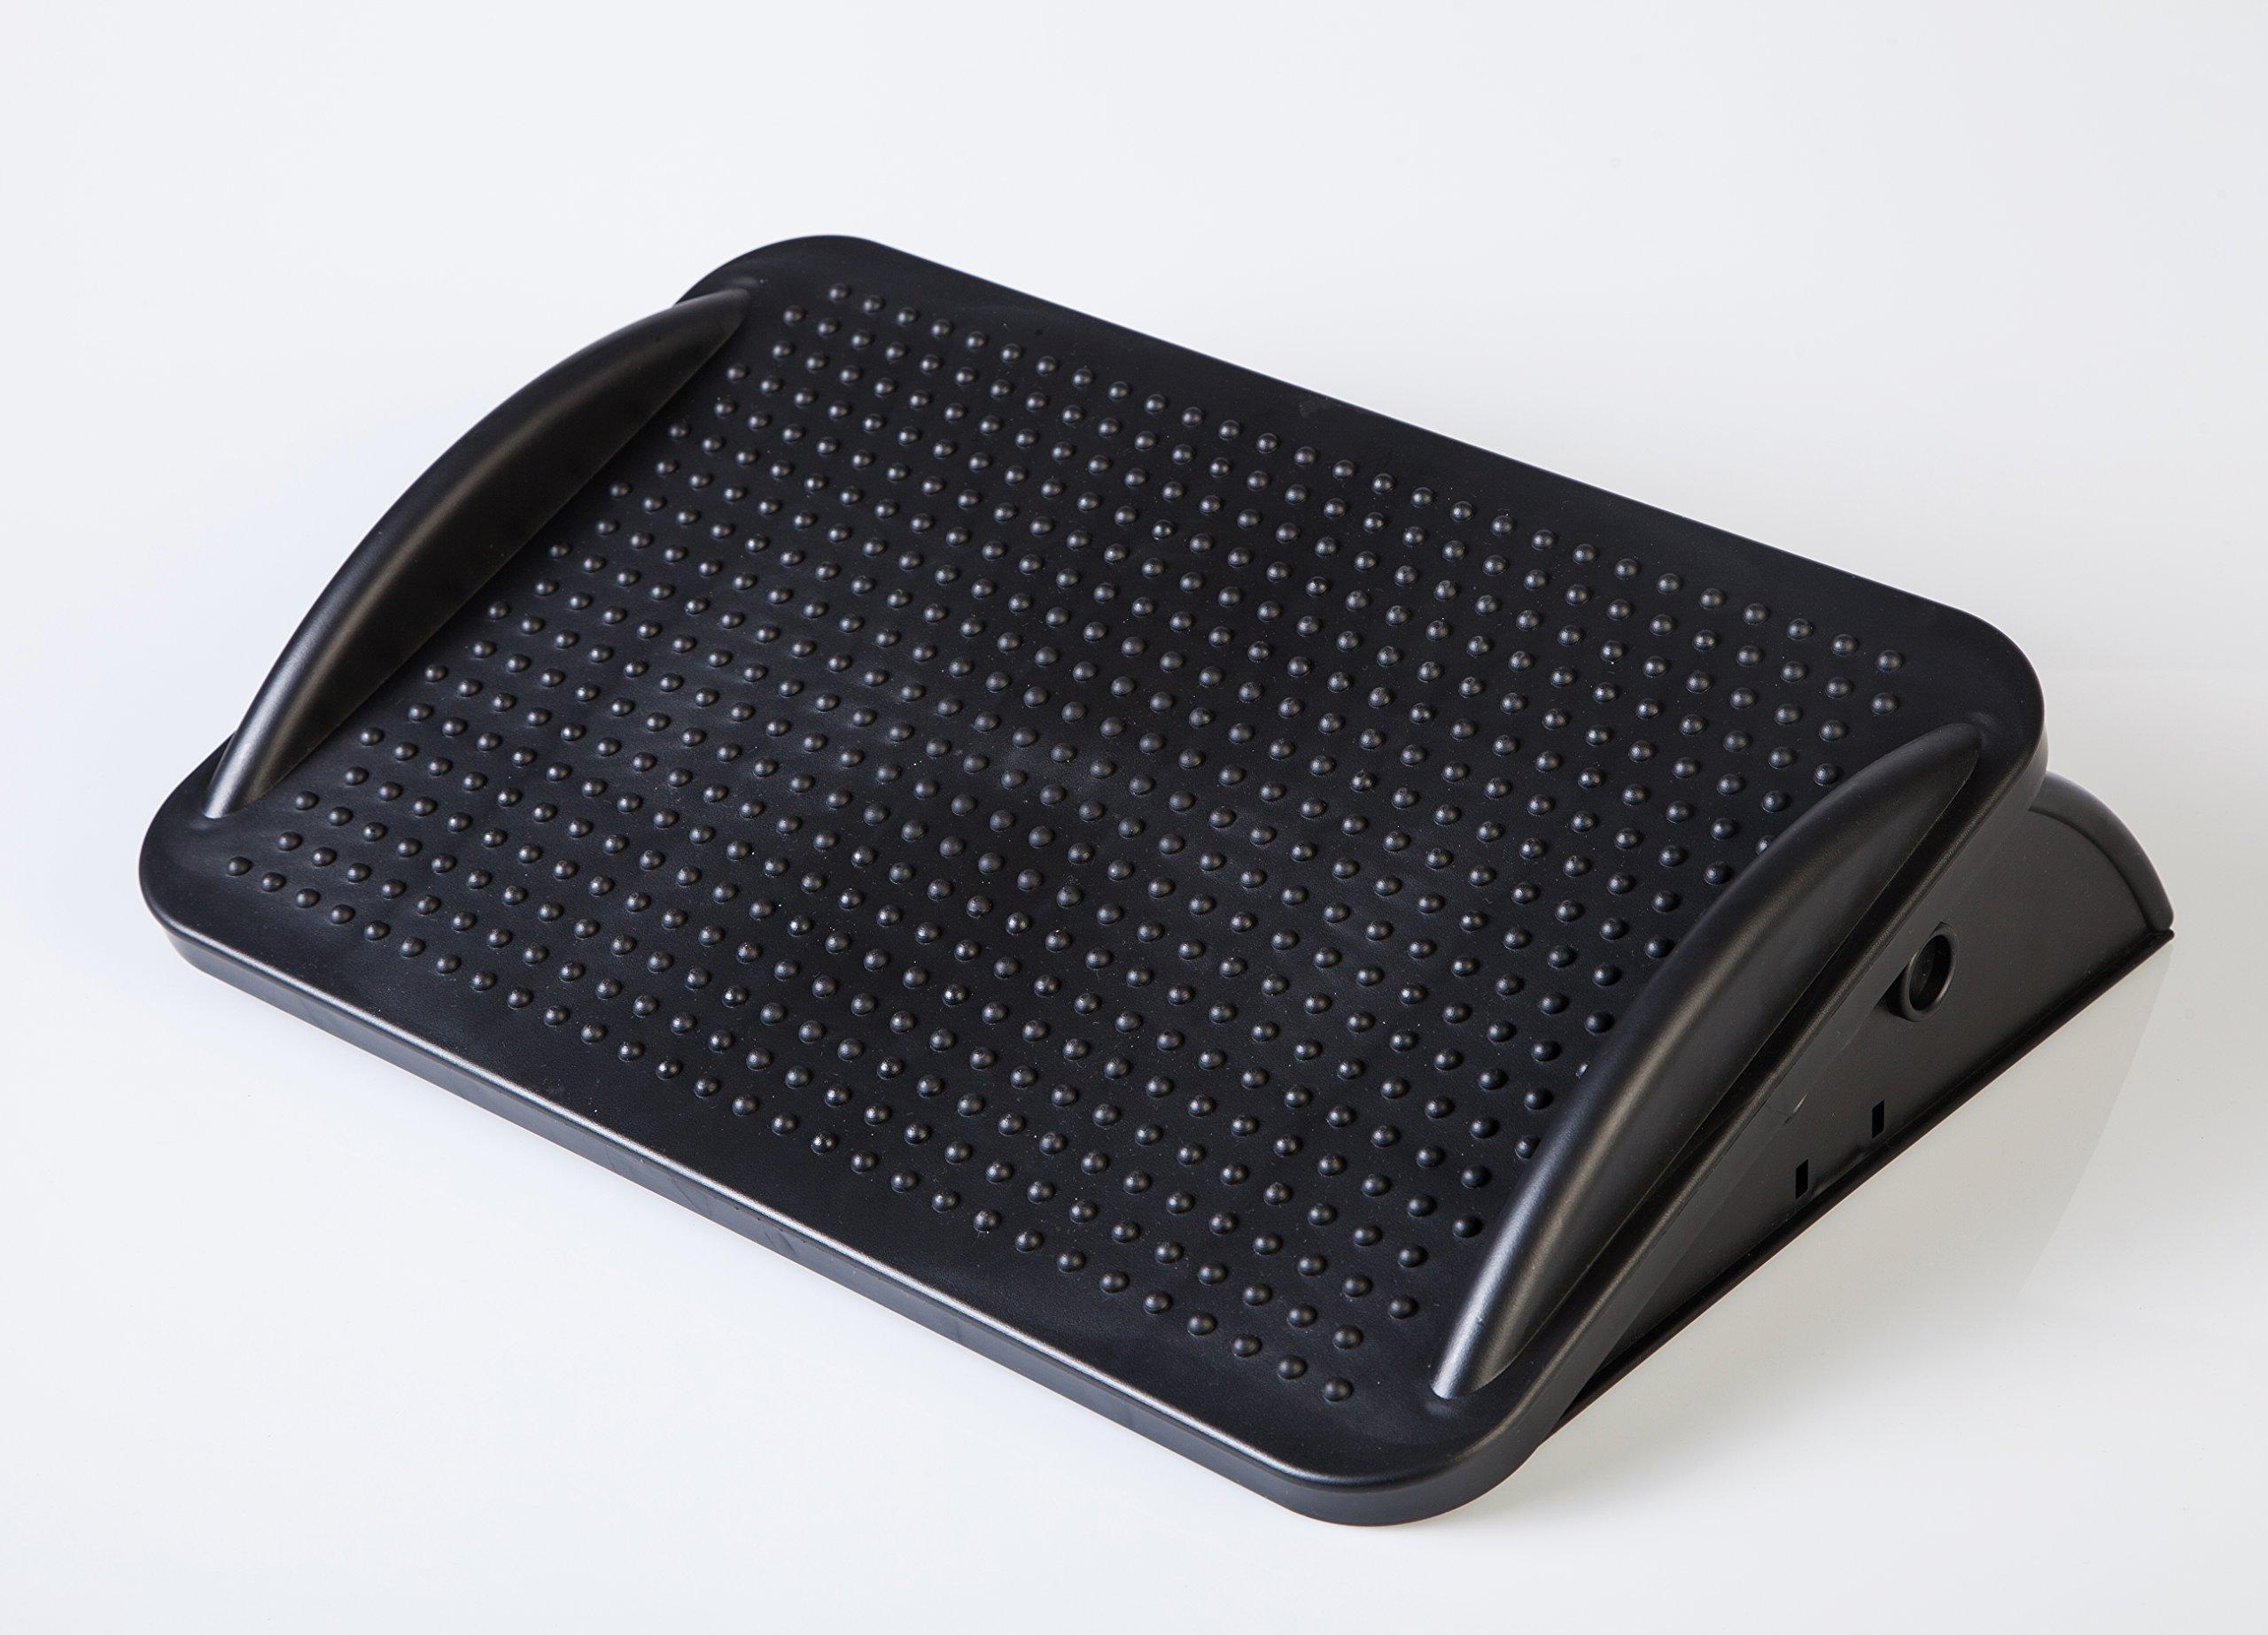 BNC Premium Ergonomic Adjustable Angle Foot Rest F6017-42.2cm X 29.5cm X 10cm - Black Color